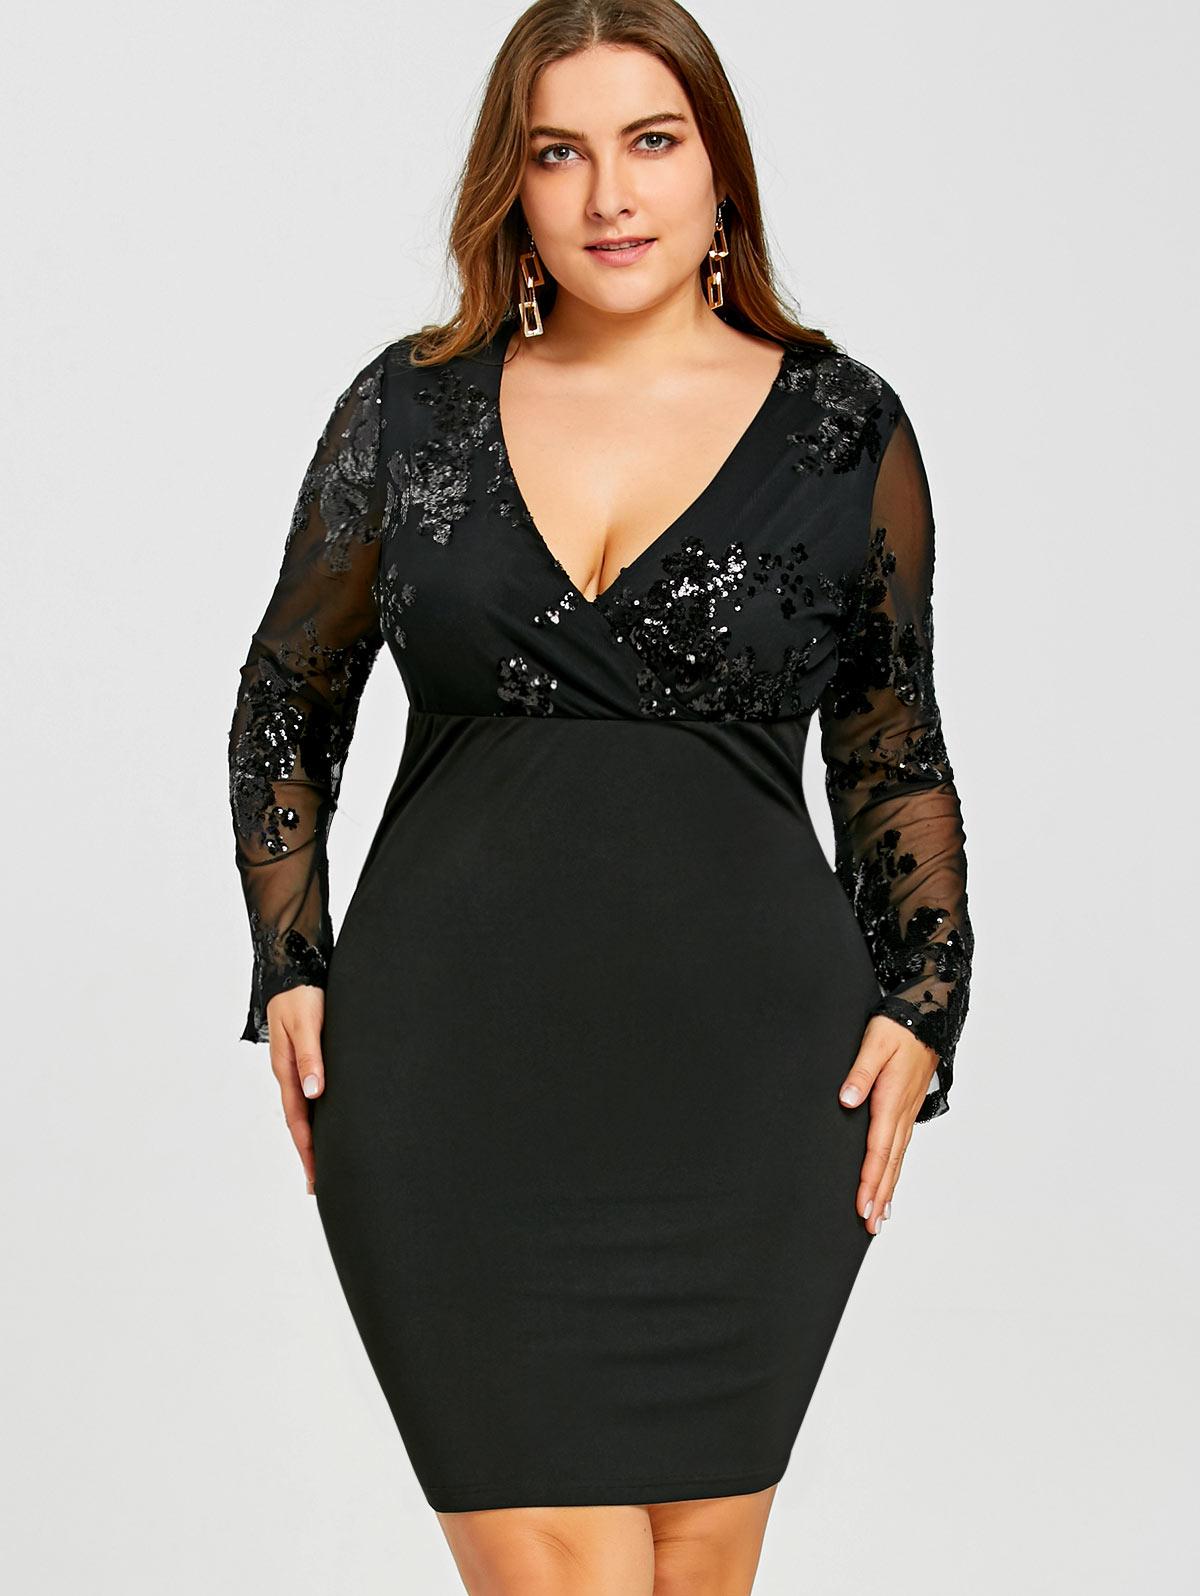 Gamiss Lace Plus Large Size Formal Party Dress Big Size Women Lace ...